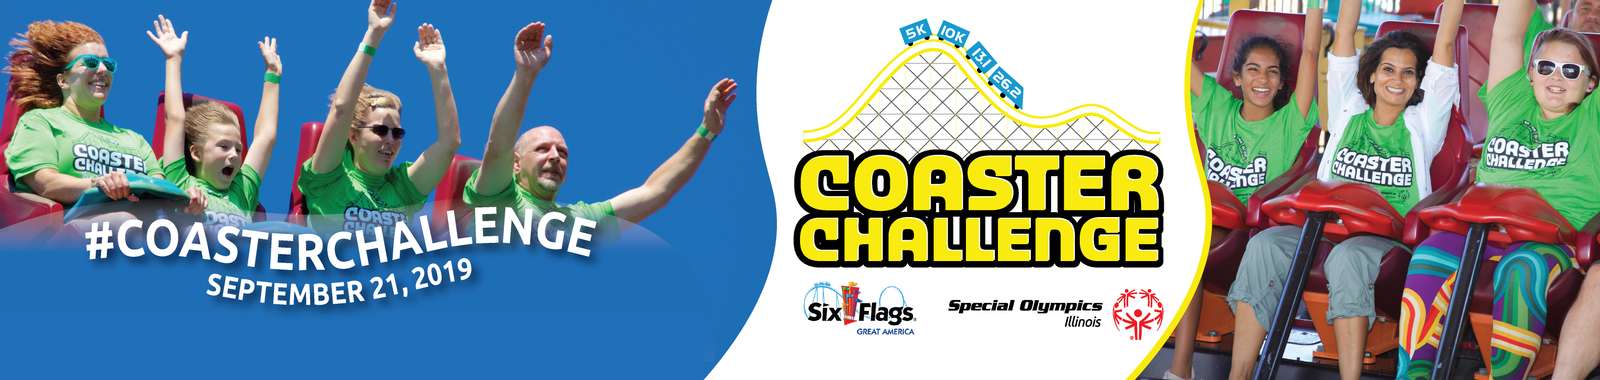 2019 Coaster Challenge